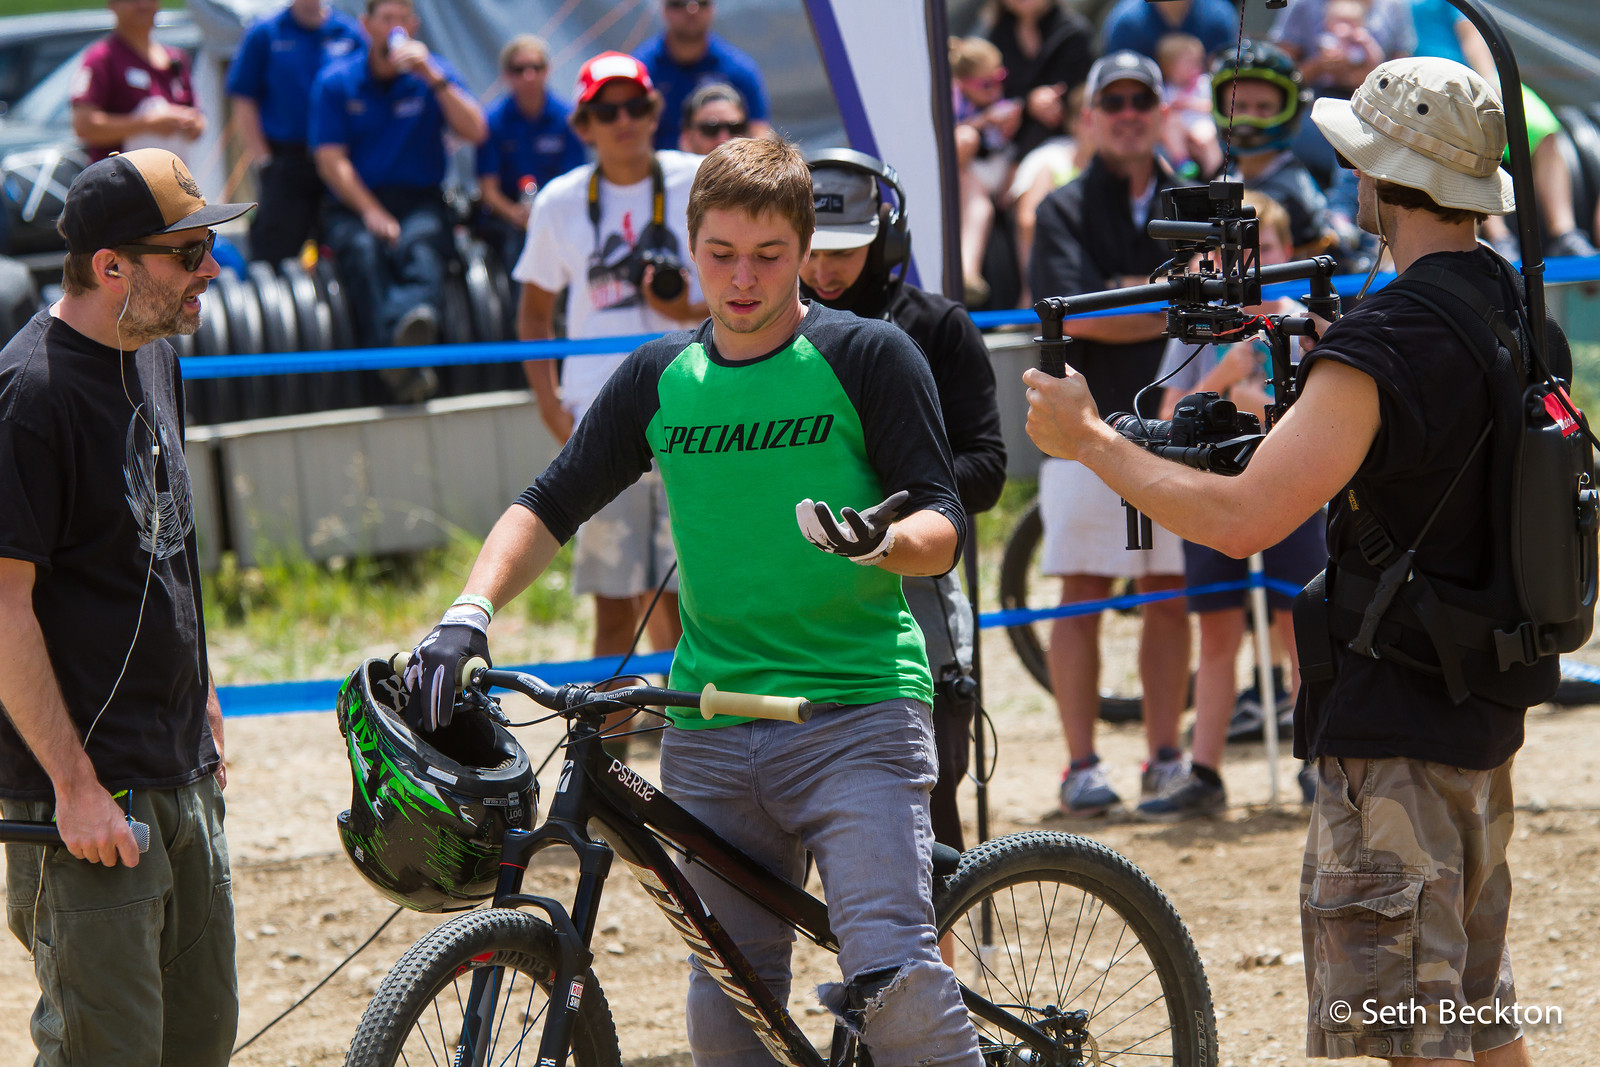 Nicholi Rogatkin - 3rd Place - Seth_Beckton - Mountain Biking Pictures - Vital MTB